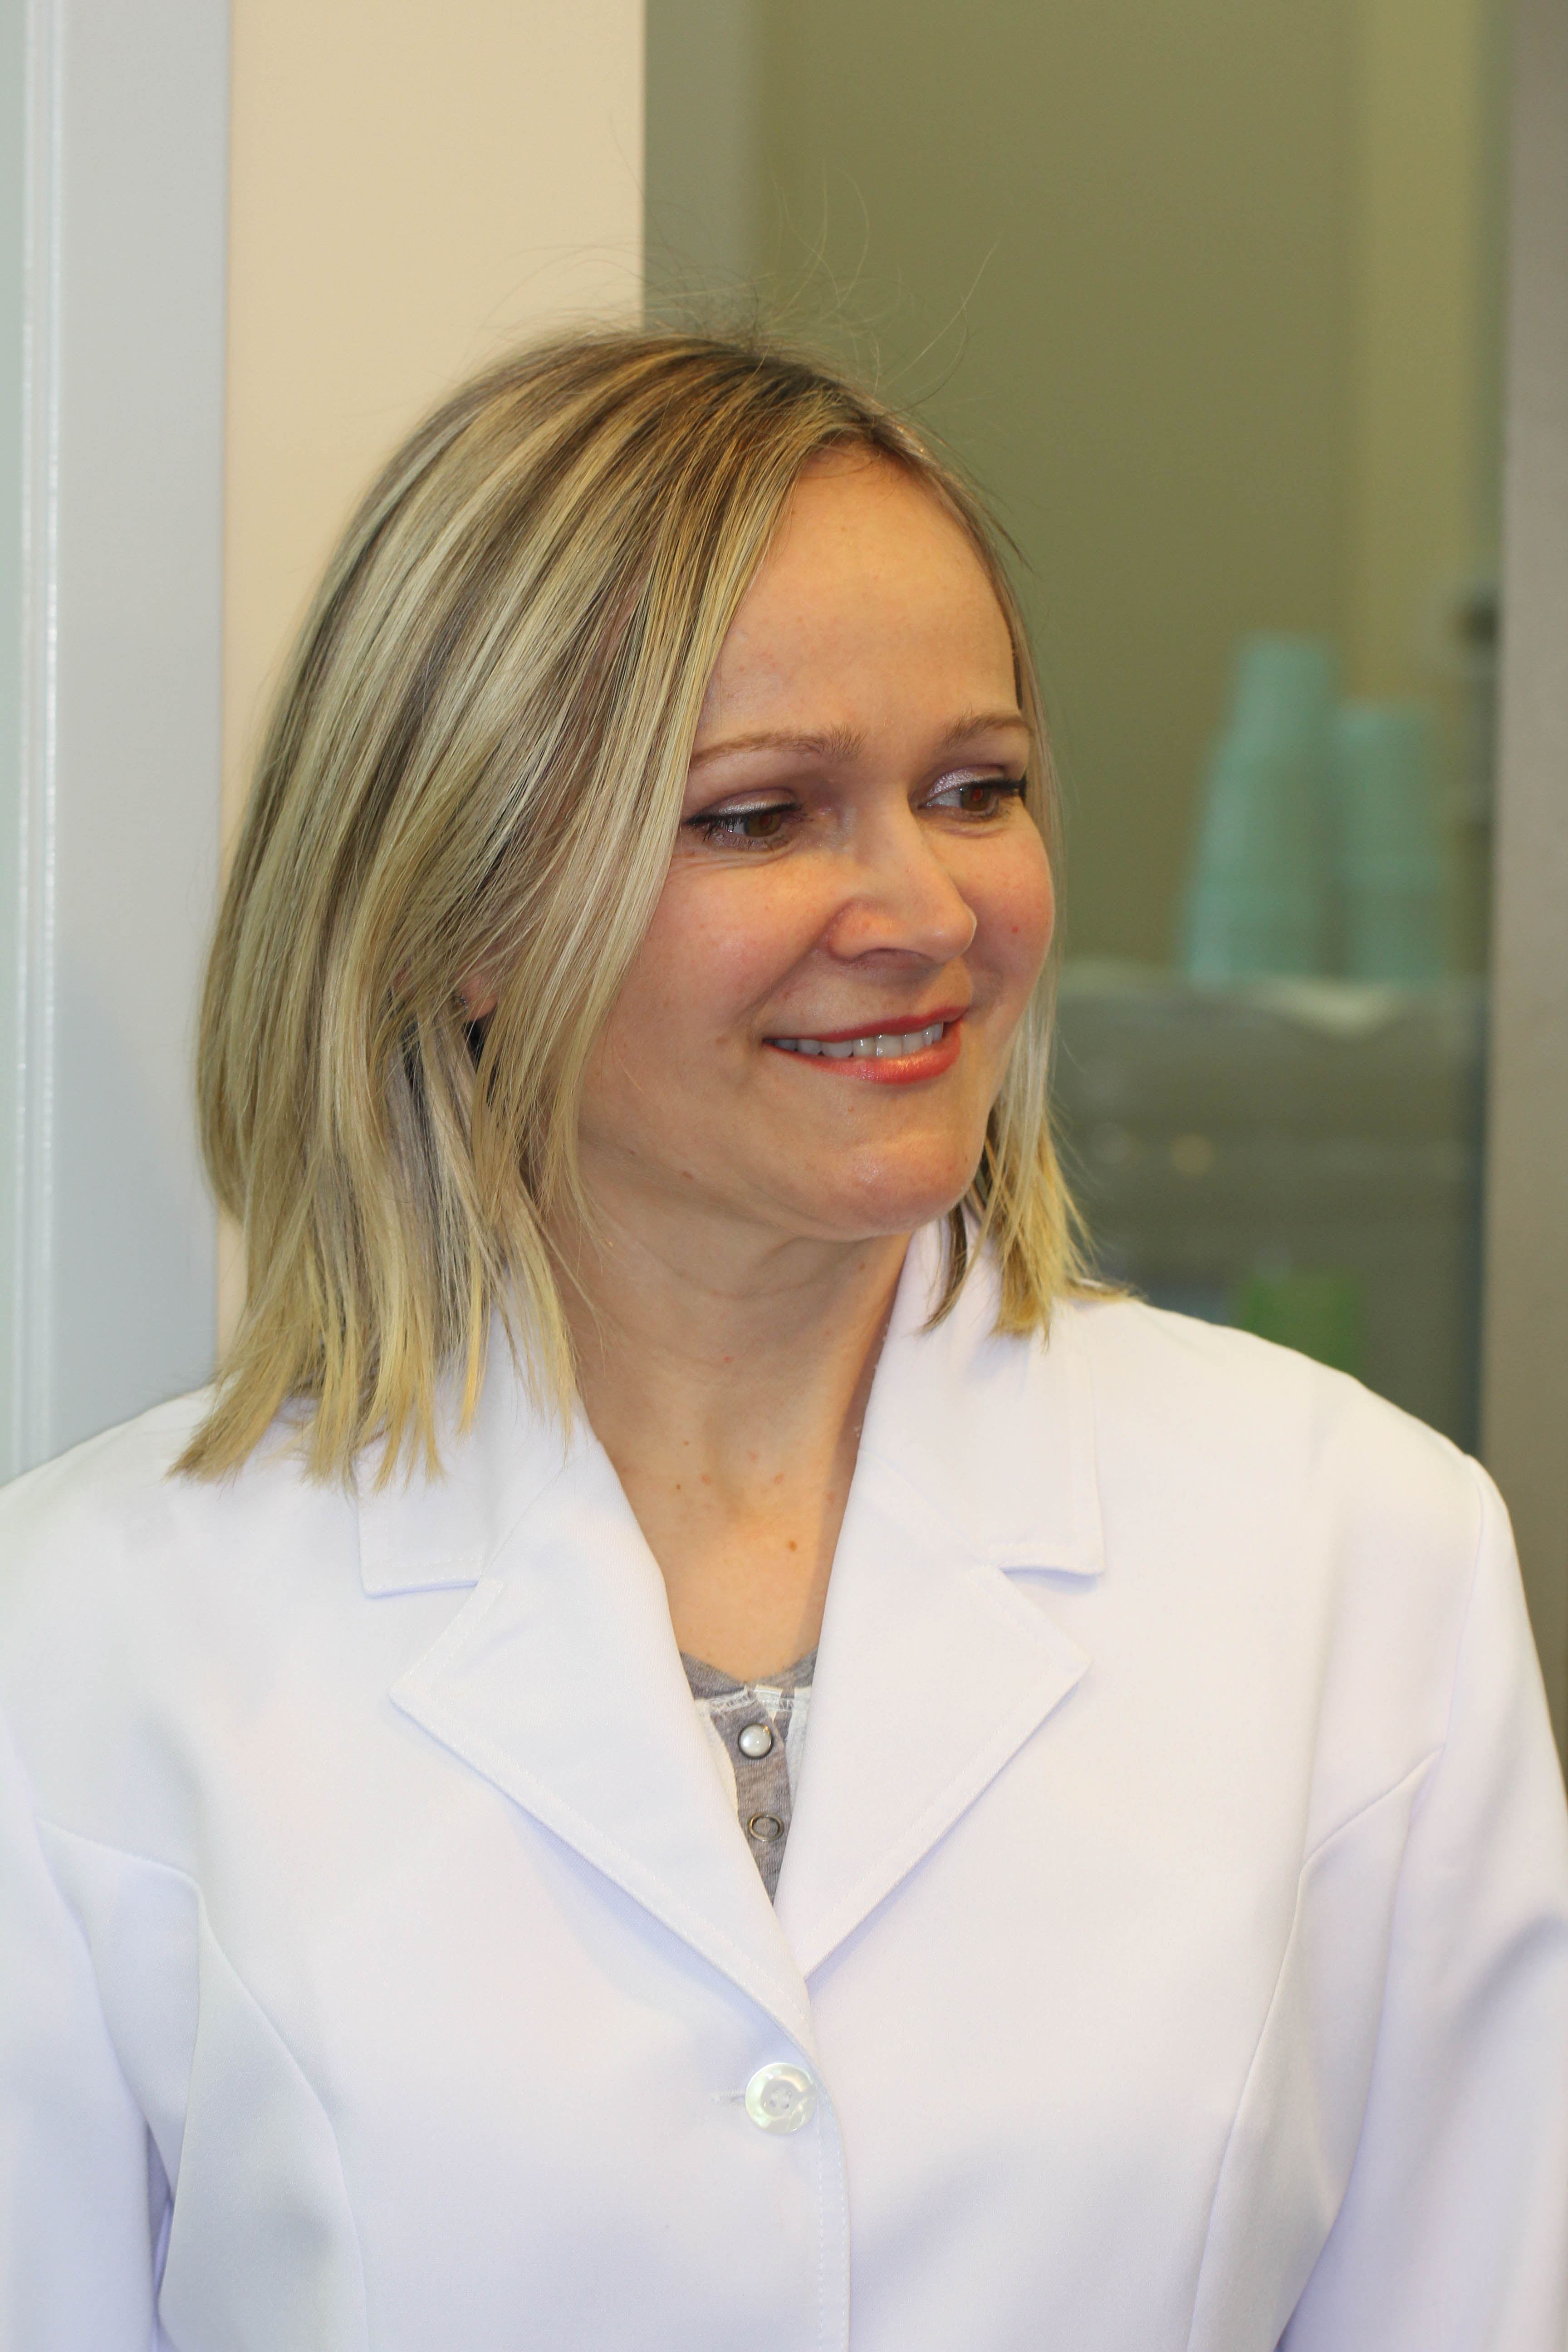 Dorota Zygmunt bio picture